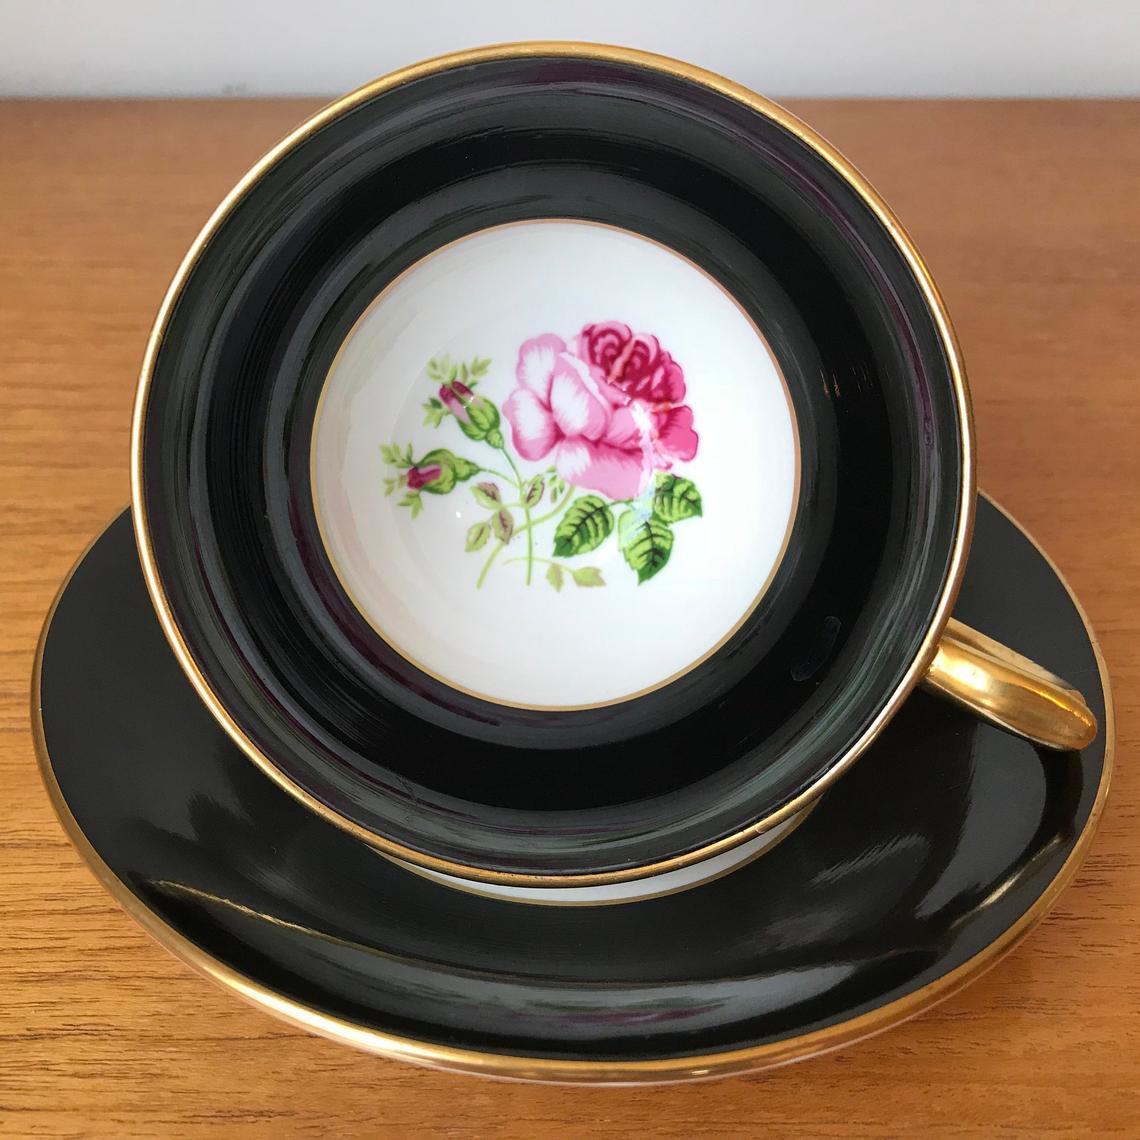 Black Teacup and Saucer with Pink Rose Centres, Windsor Bone China Tea Cup, and Saucer